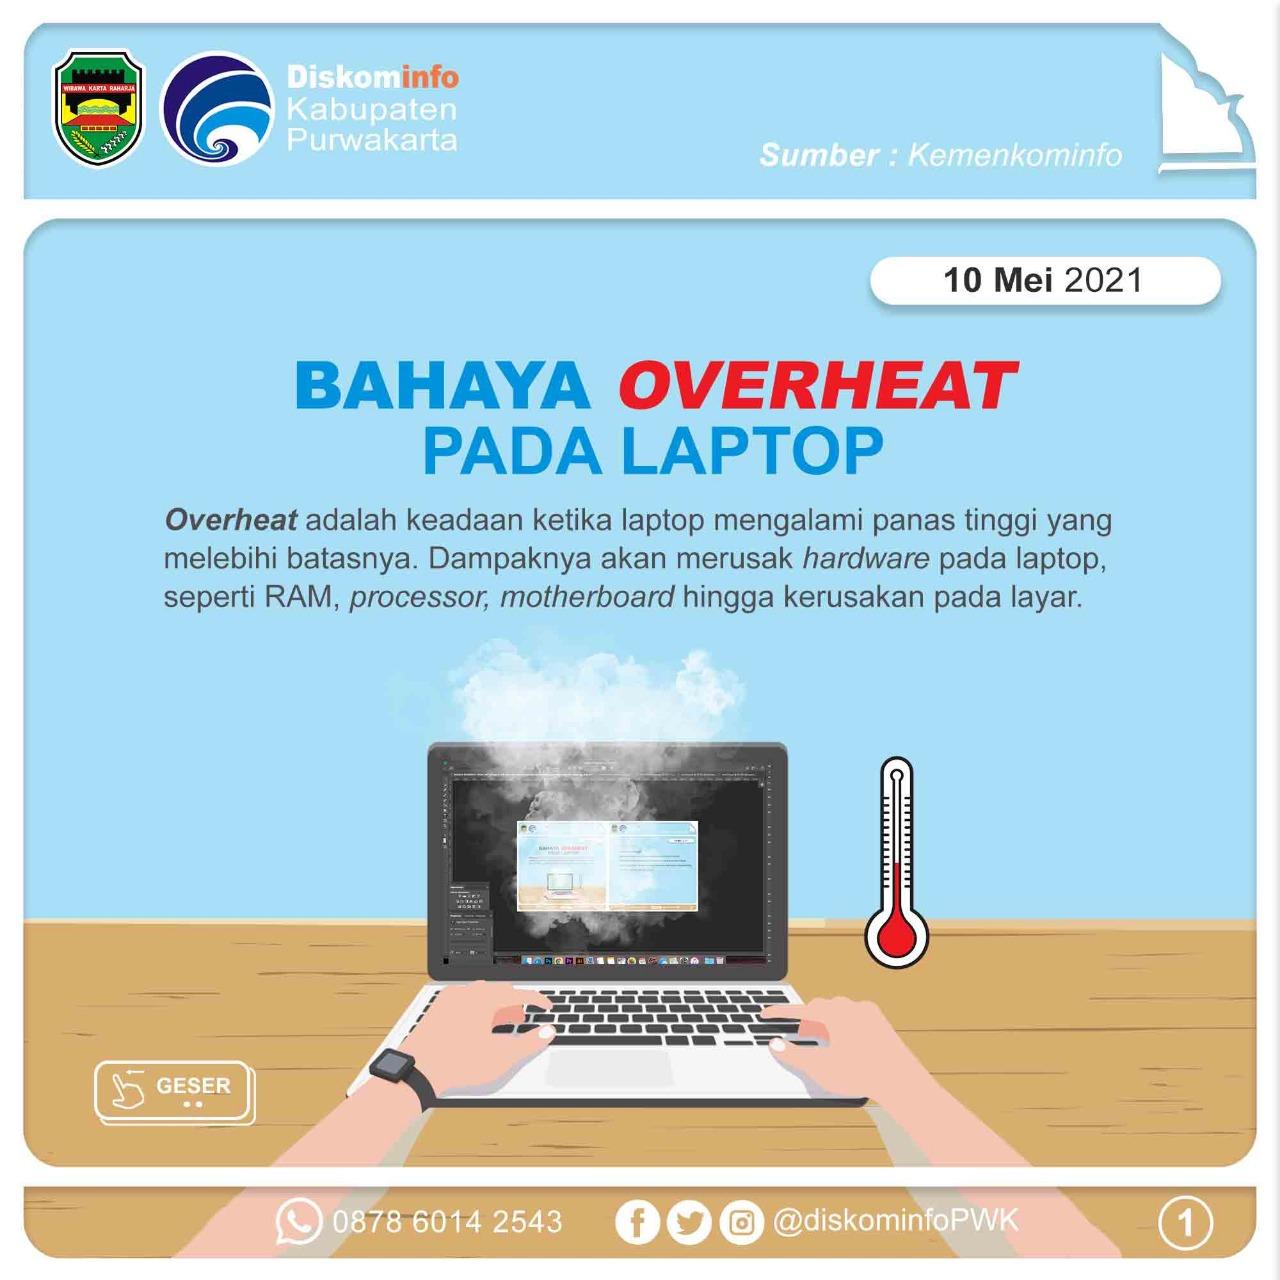 Bahaya Overheat Pada Laptop